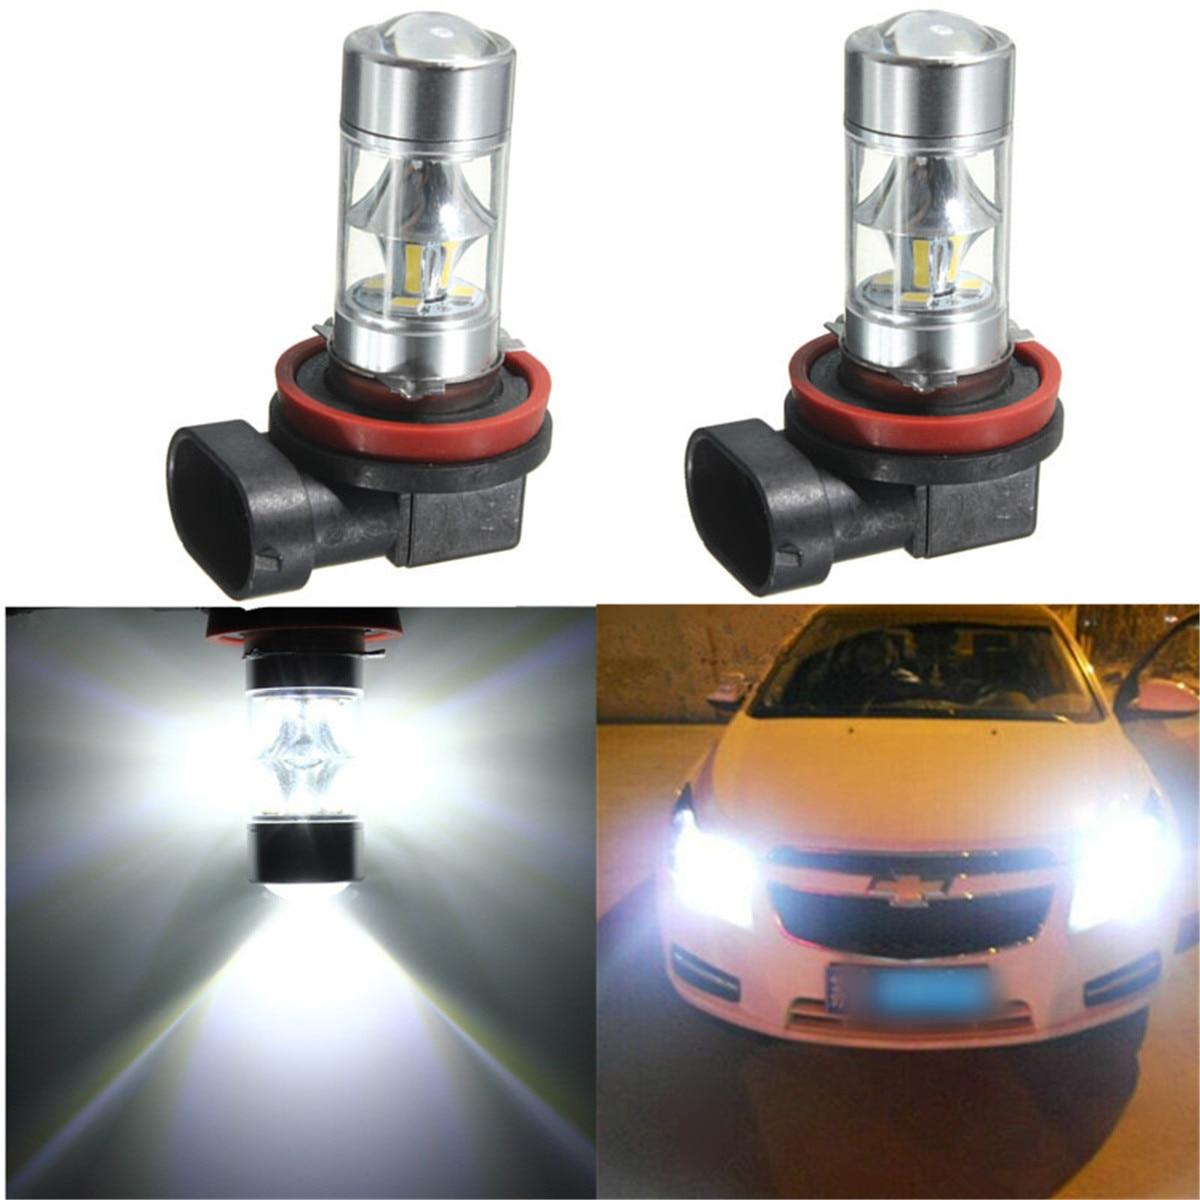 Car Headlight Bulbs(led) Strict 2pcs High Quality H8 Fog Light 15 Smd 2835 Led H11 Hb3 9005 9006 High Power Led Drl Bulb Fog Driving Light Bulb White Yellow 12v High Quality Goods Automobiles & Motorcycles